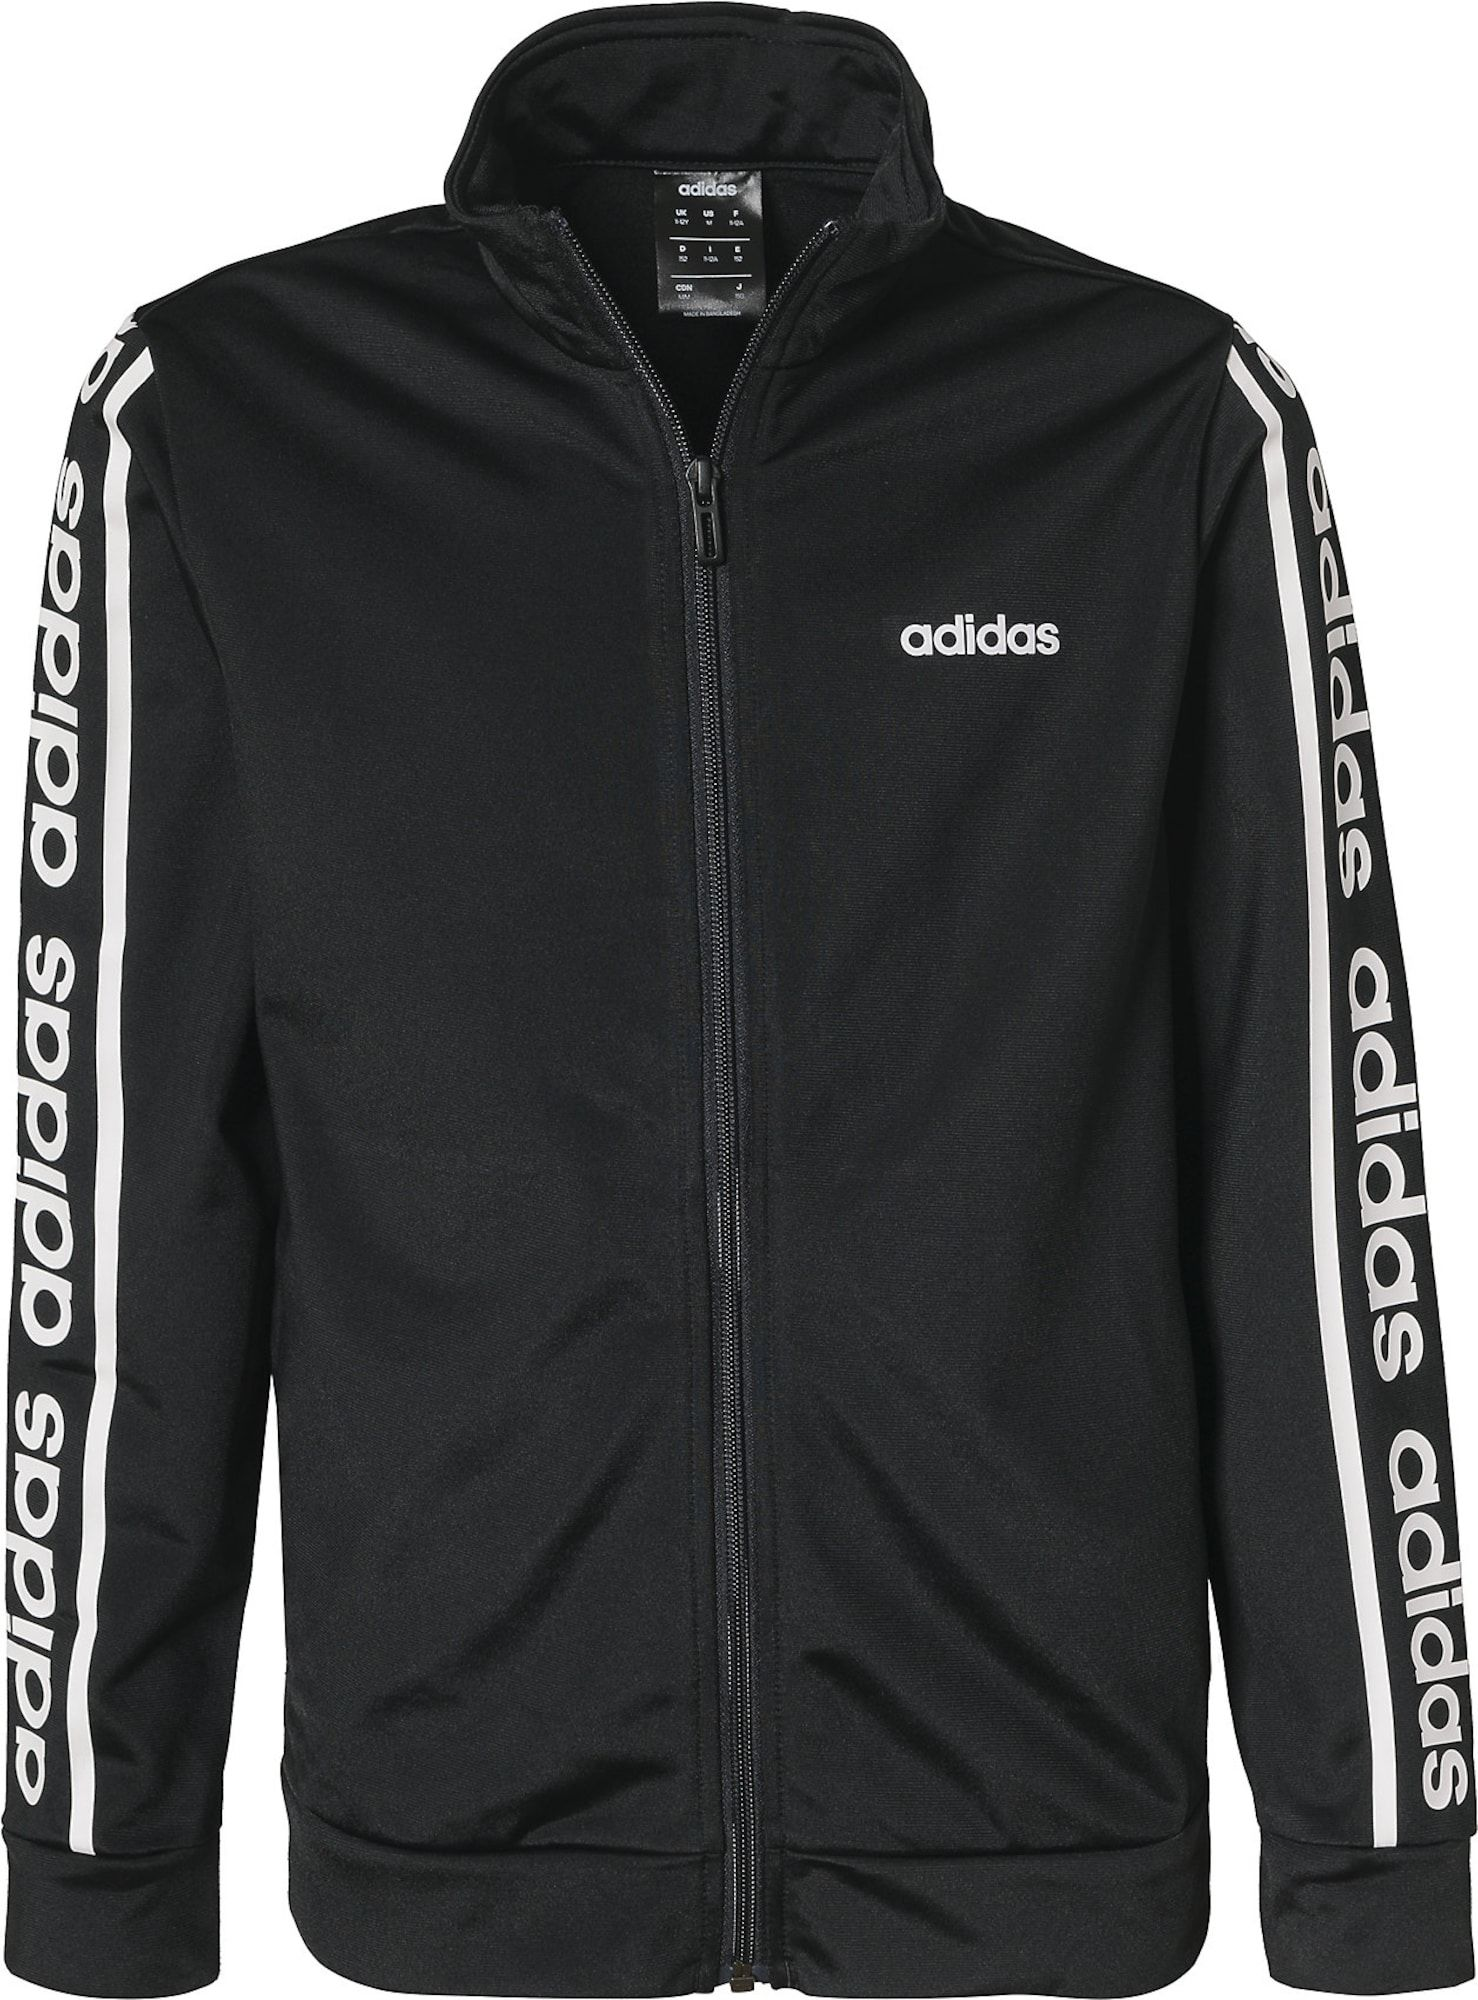 trainingsanzug adidas schwarz weiß